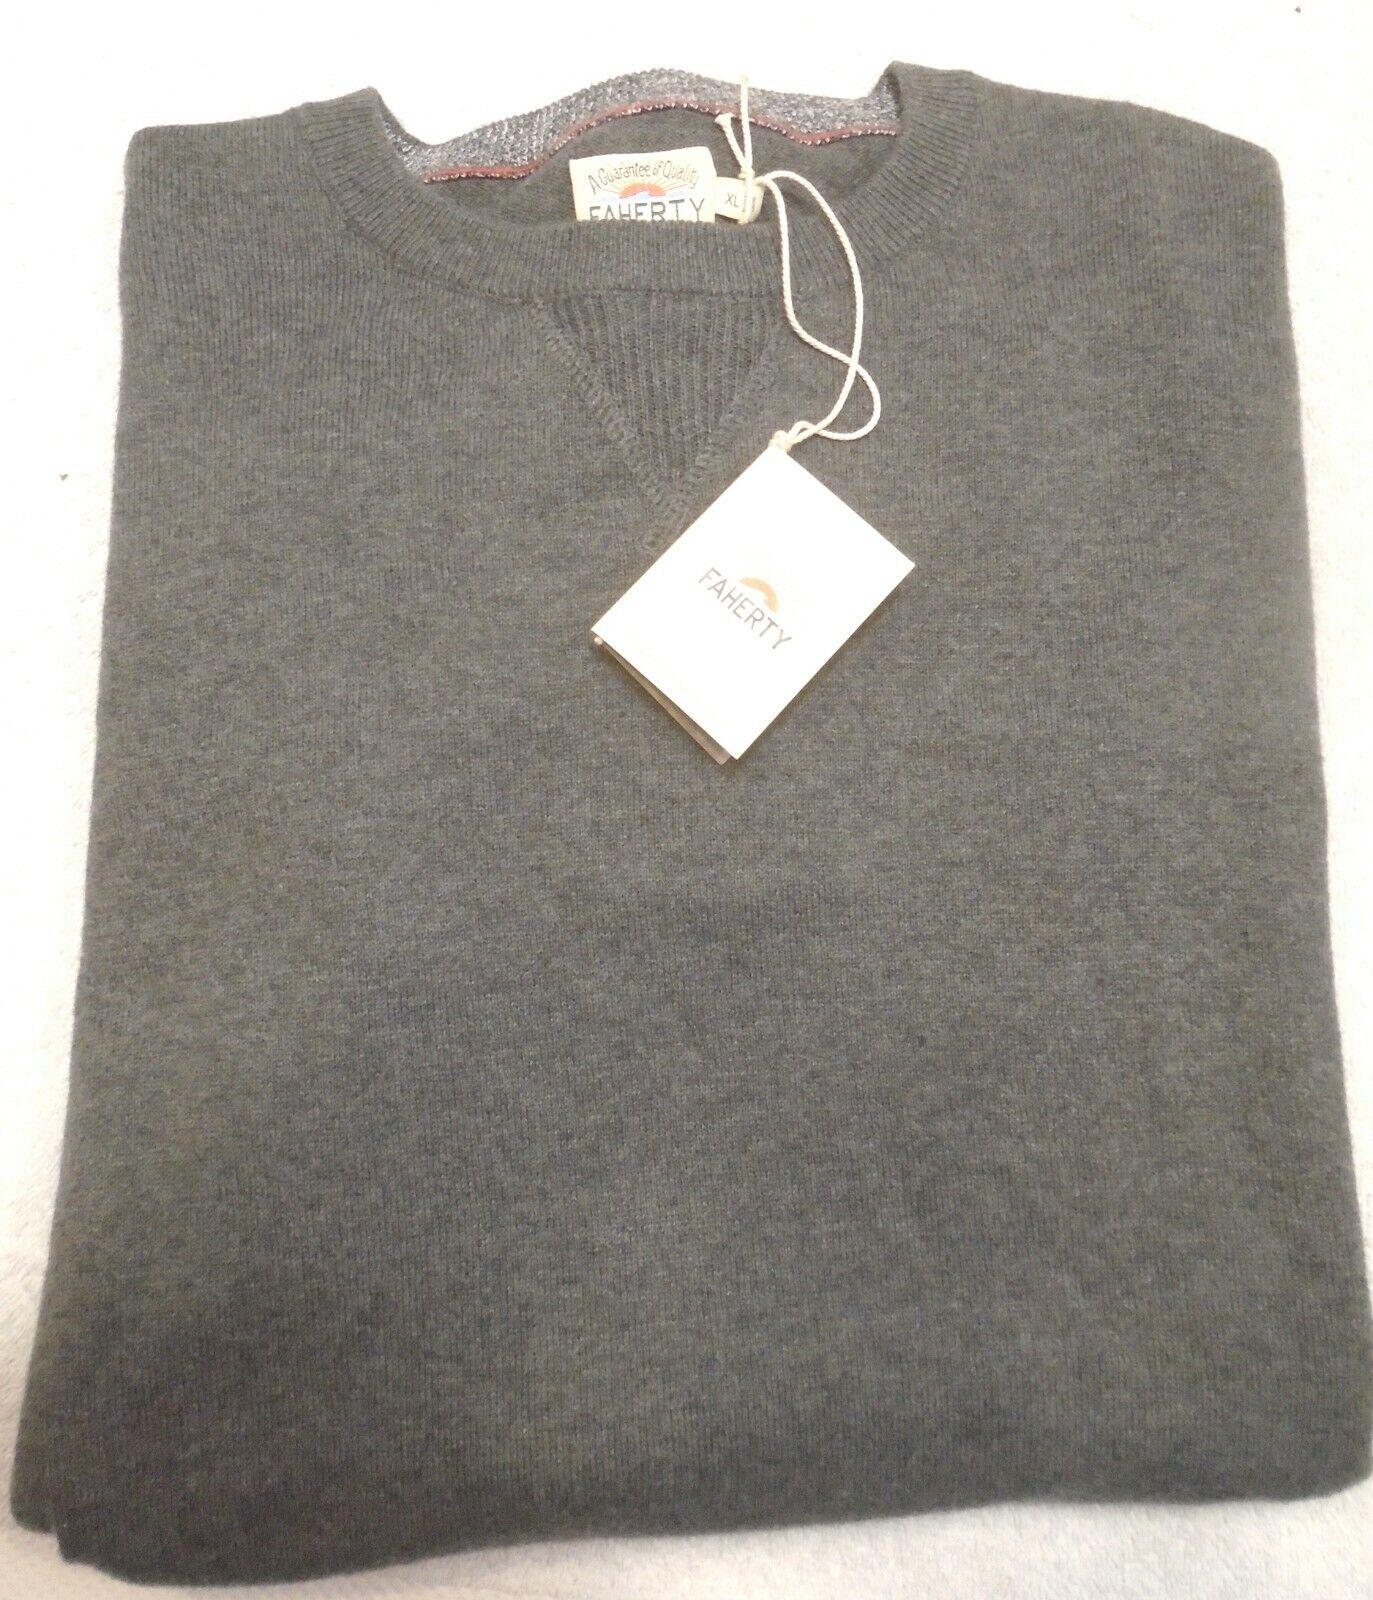 Faherty Cotton & Cashmere Blend Sconset Crewneck Sweater NWT XL $128 Gray